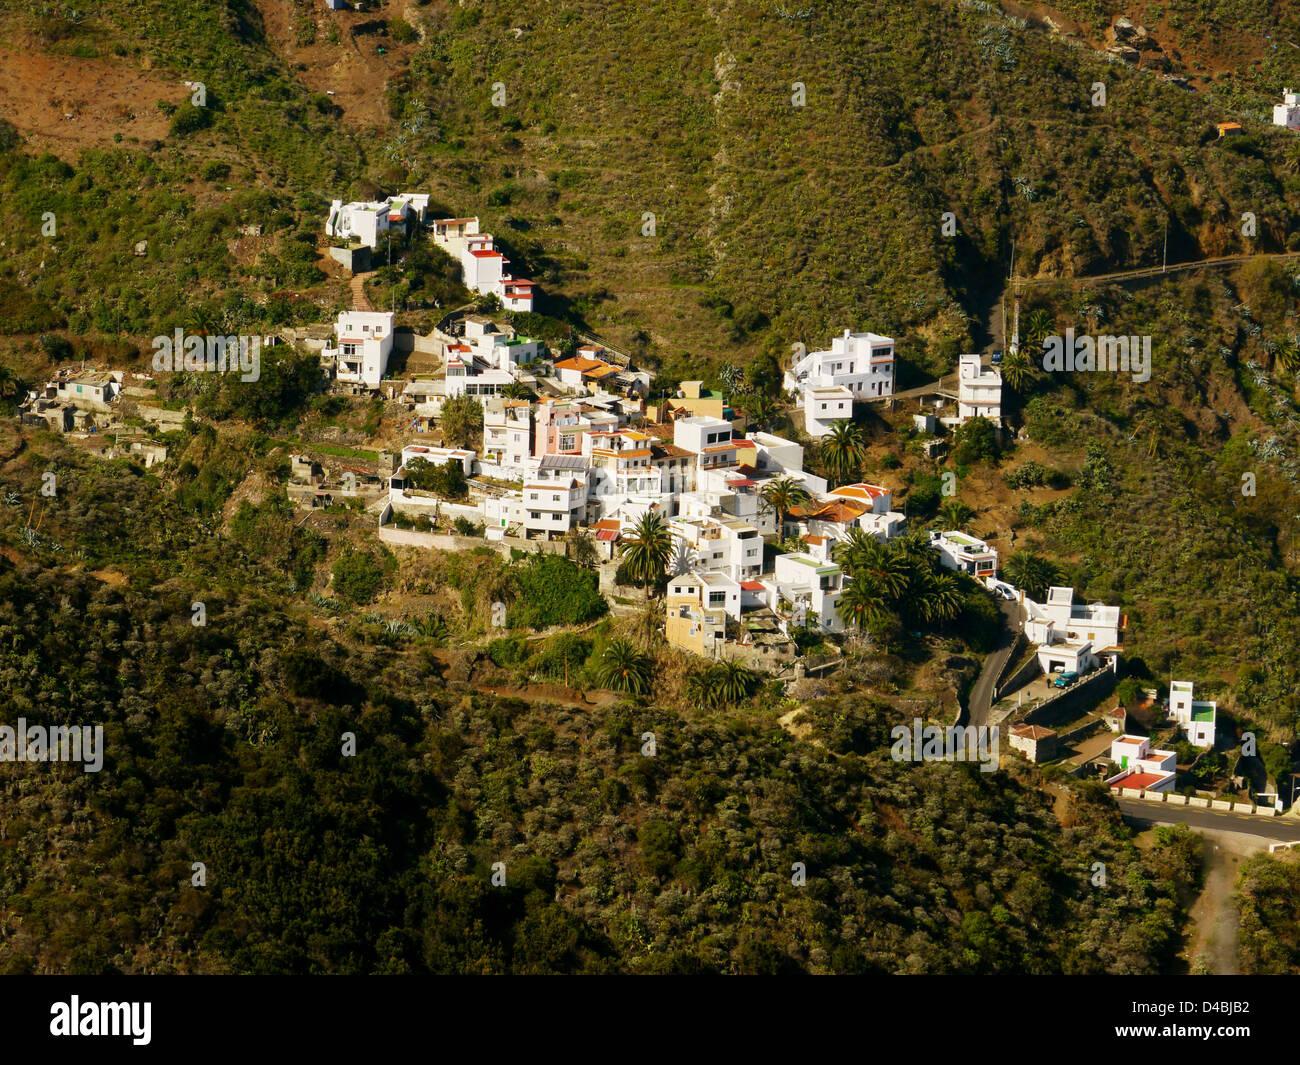 Dorf Taganana, Teneriffa, Kanarische Inseln, Spanien Stockbild